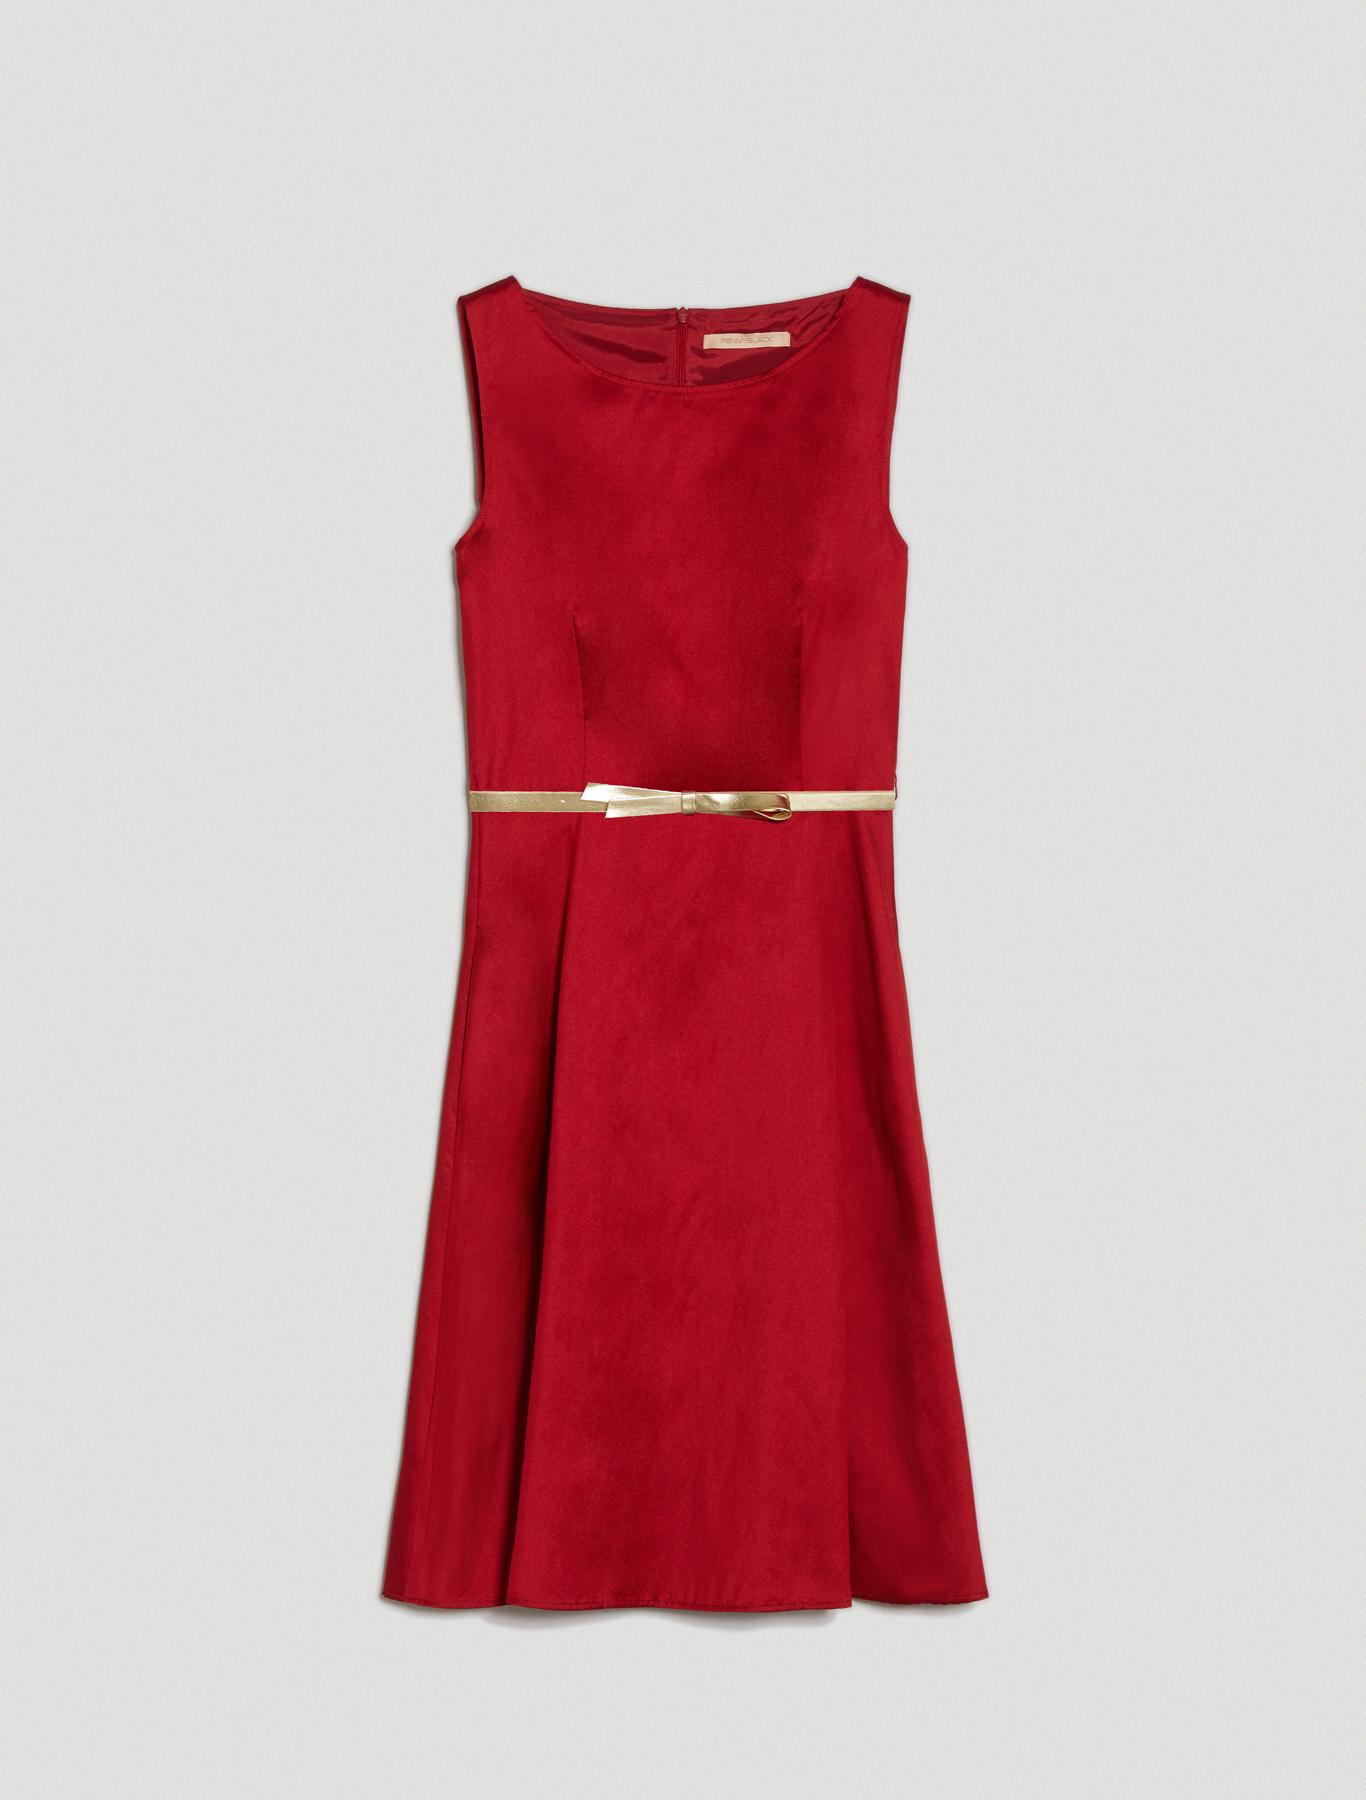 Fit & flare dress in taffeta - red - pennyblack